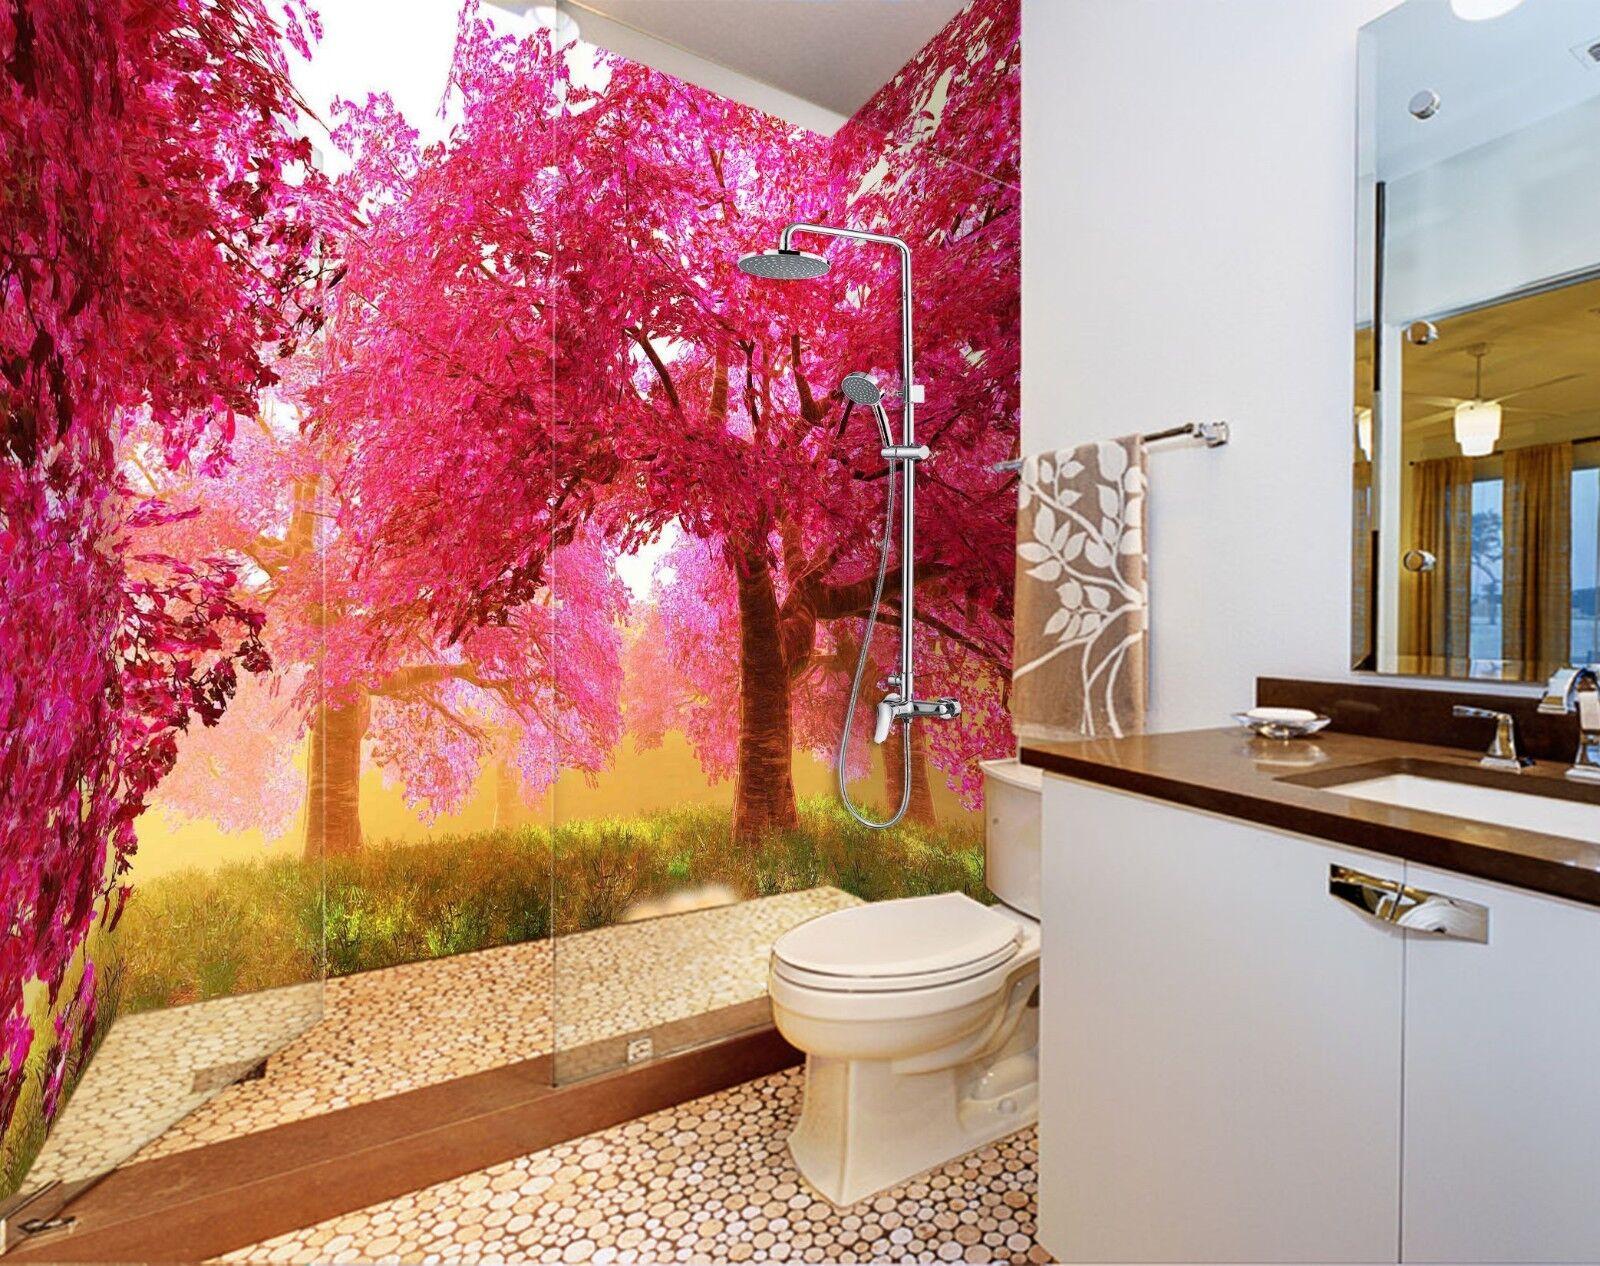 3D ROT tree lawn 6437 WallPaper Bathroom Print Decal Wall Deco AJ WALLPAPER UK